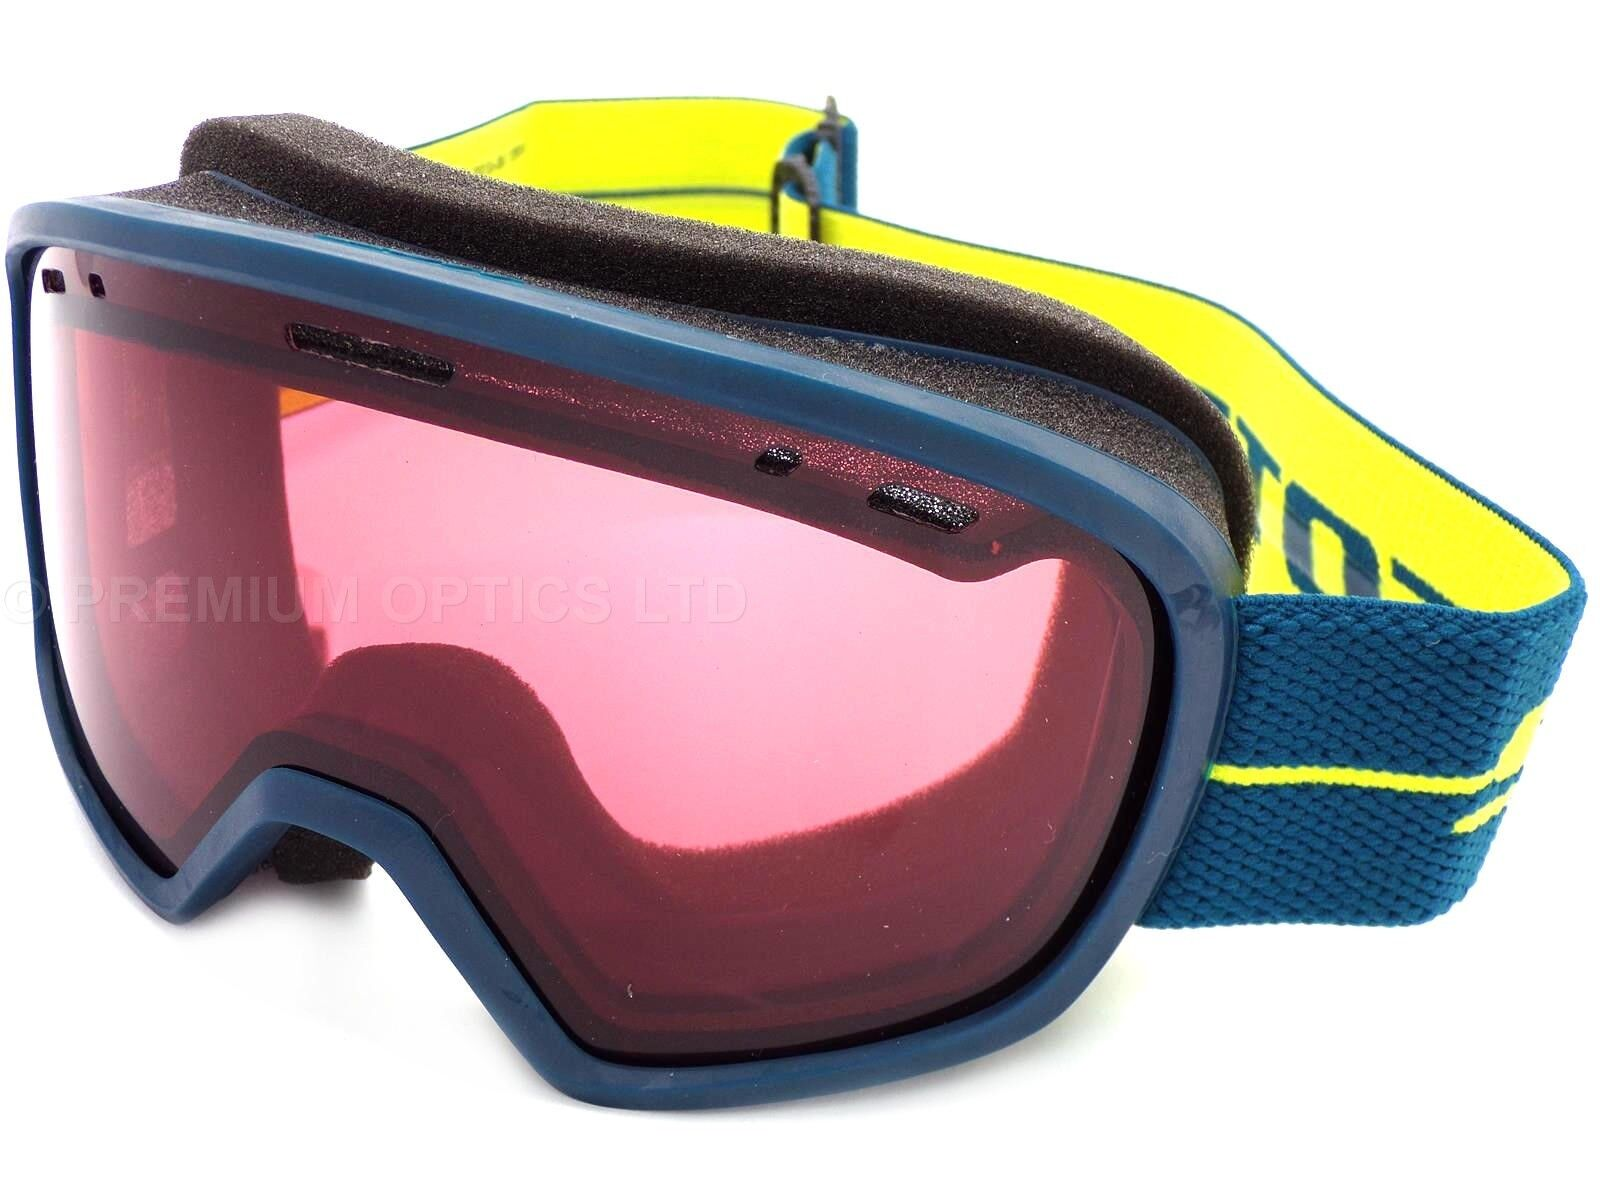 SCOTT - MUSE  women's ski snow Goggles bluee Yellow   Enhancer CAT-2 Lens 267609  60% off